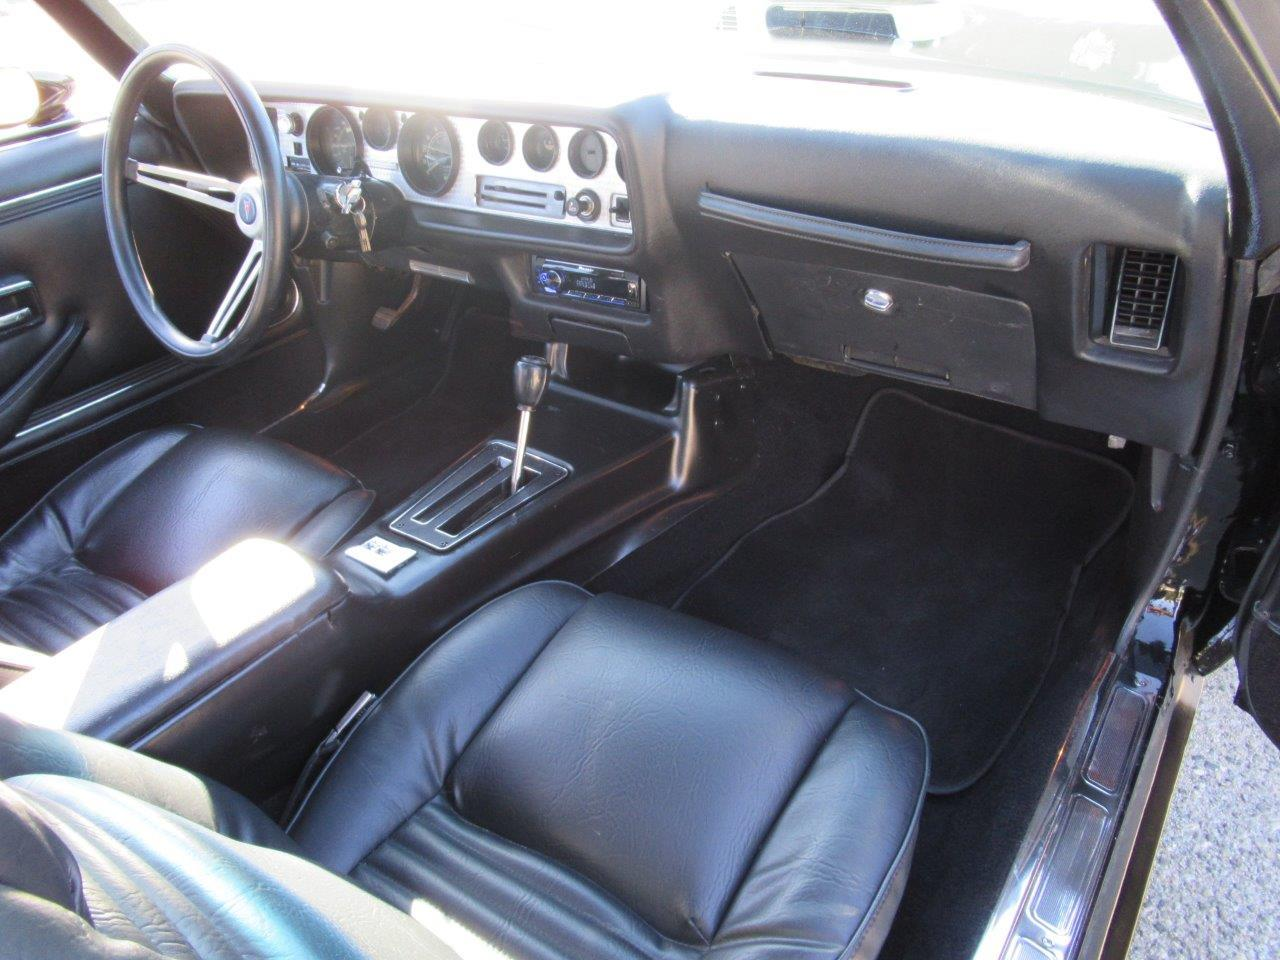 1979 Pontiac Firebird Trans Am (CC-1320297) for sale in Simi Valley, California